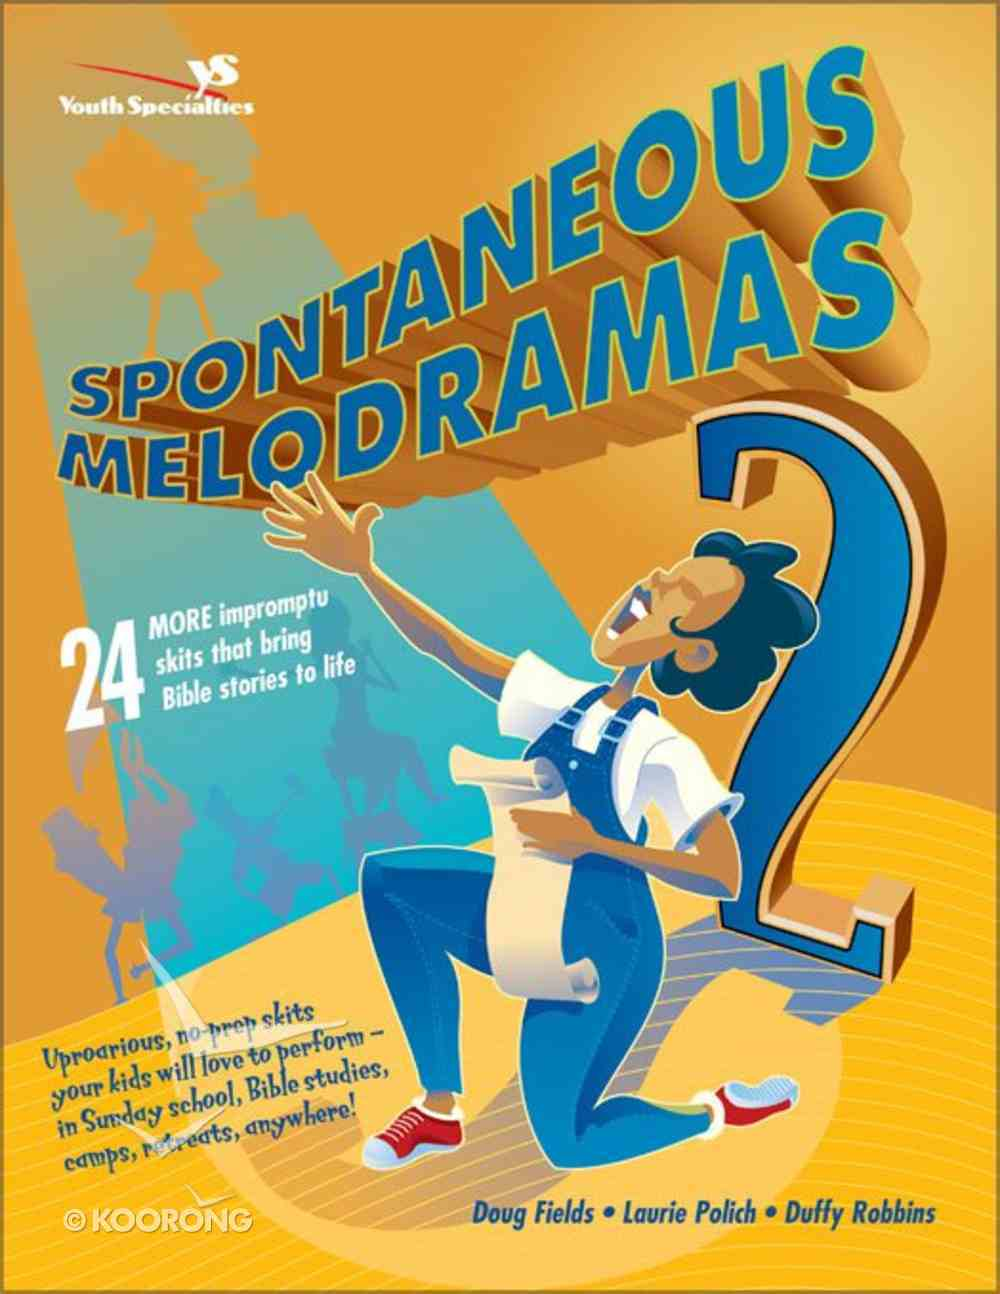 Spontaneous Melodramas 2 eBook